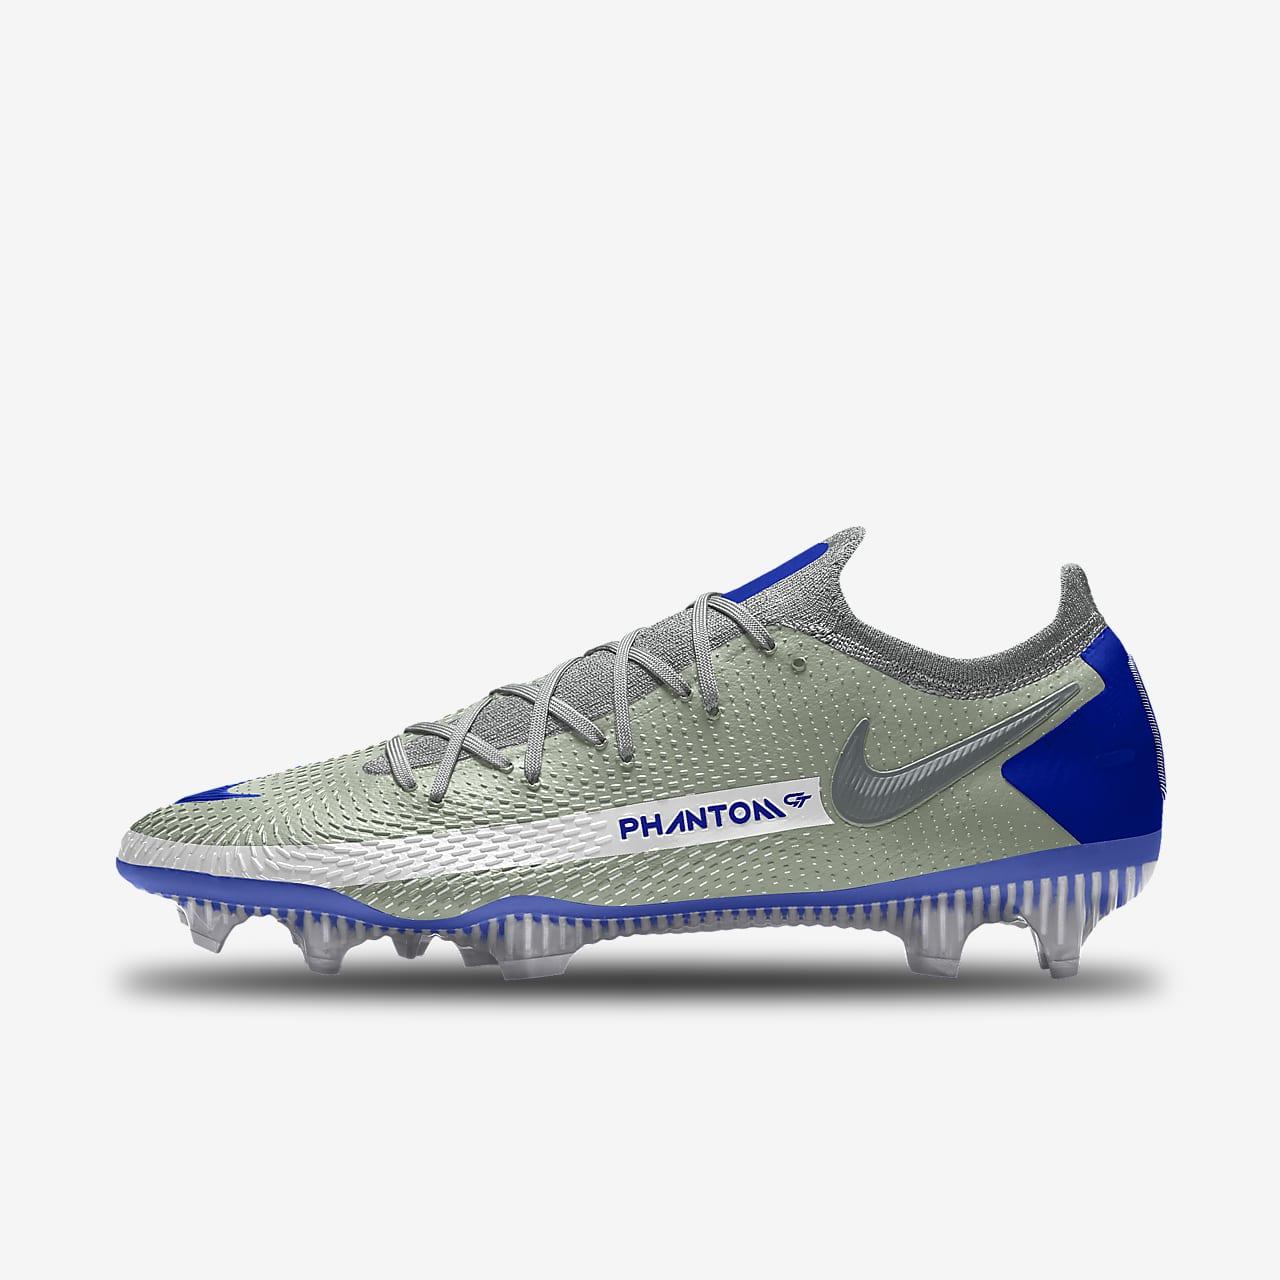 Nike Phantom GT Elite By You 专属定制暗煞系列天然硬质草地足球鞋